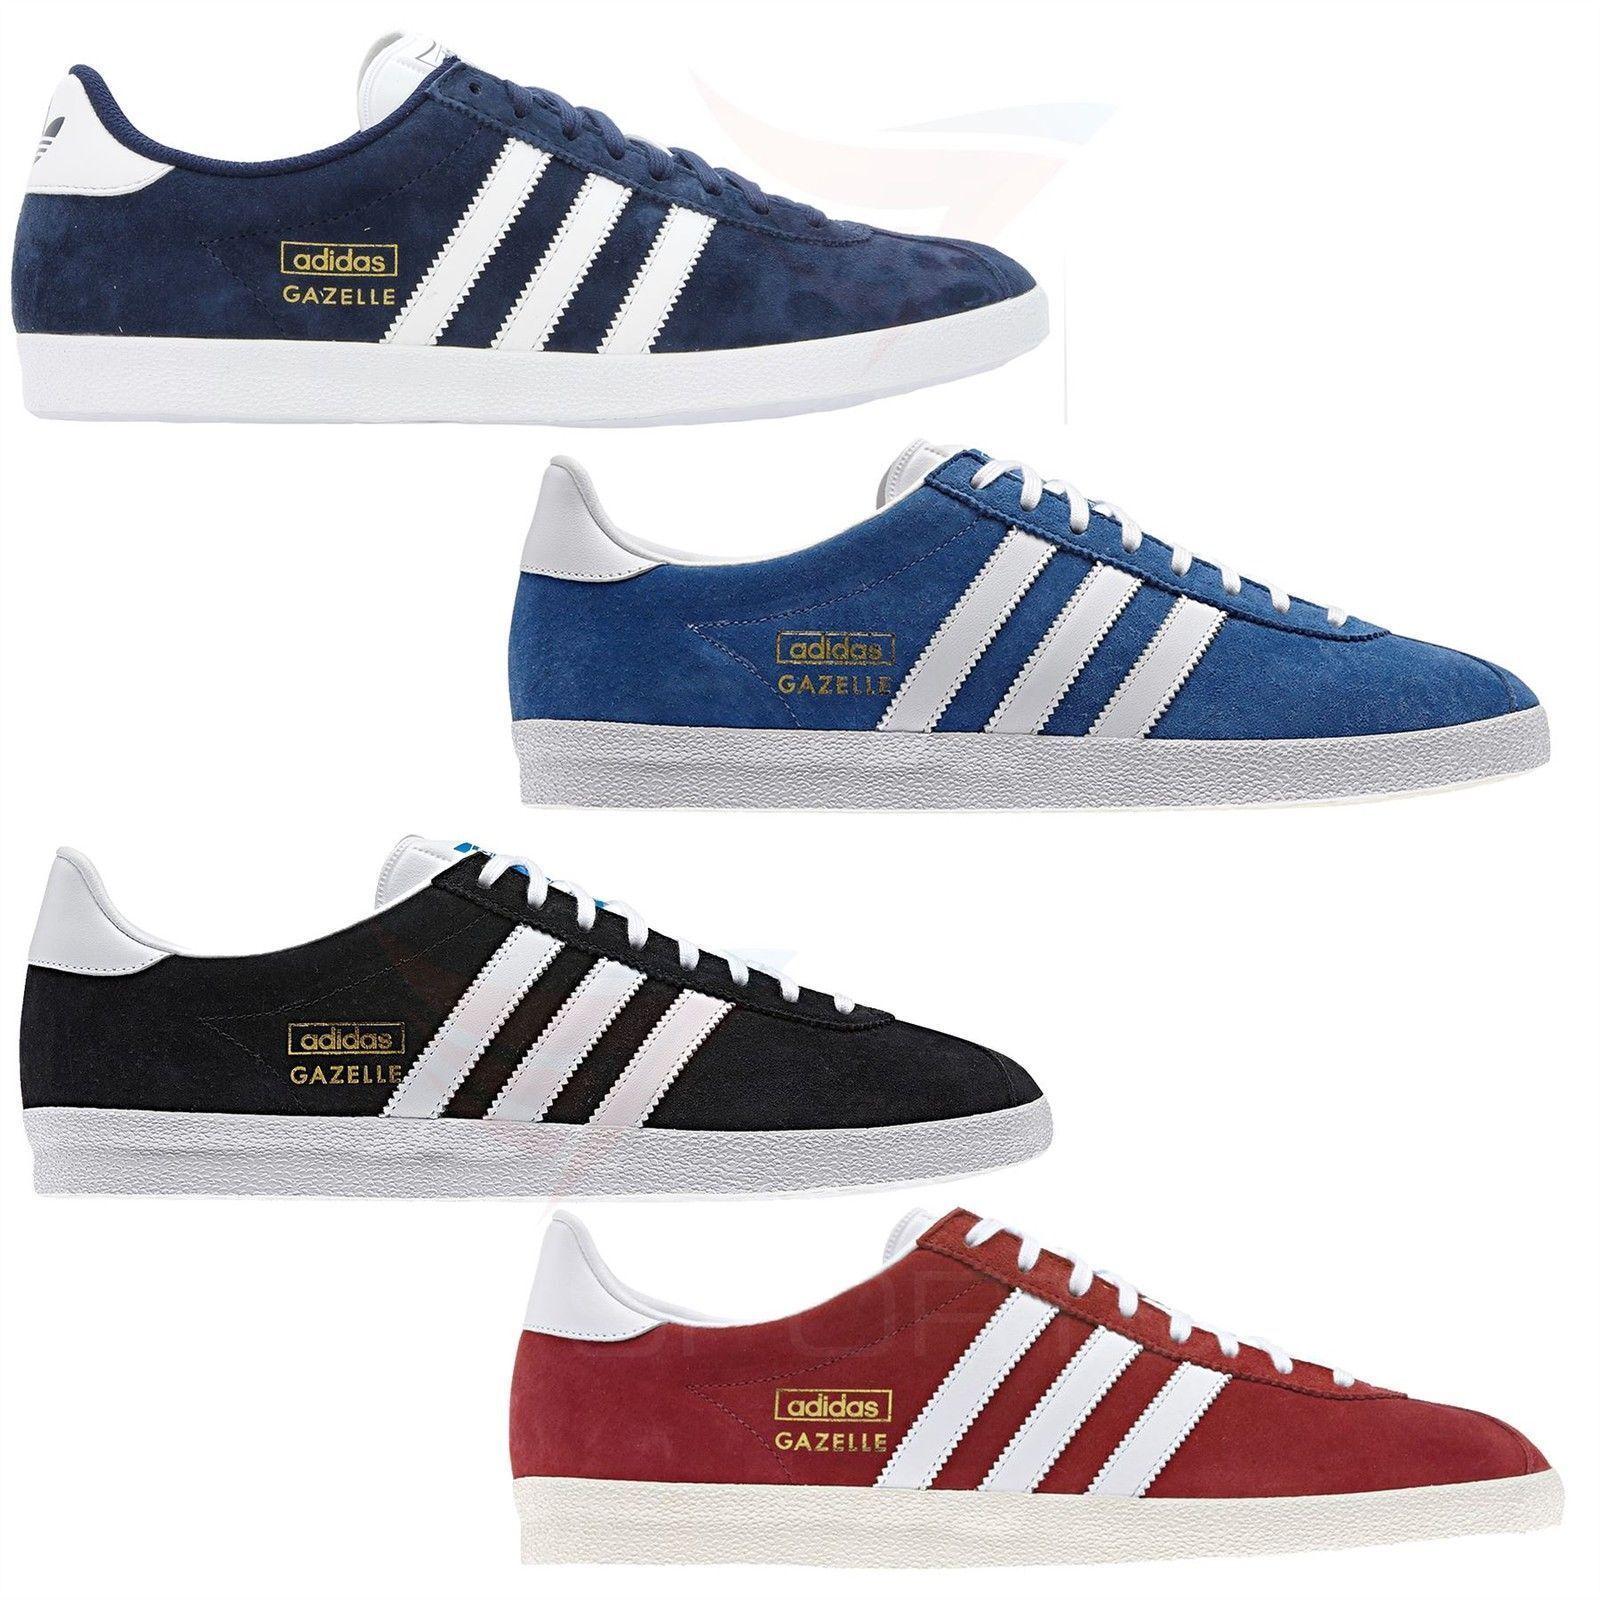 Adidas, Gazella Og, de moda clásica, zapatos de deporte rojo, negro, azul y marino.